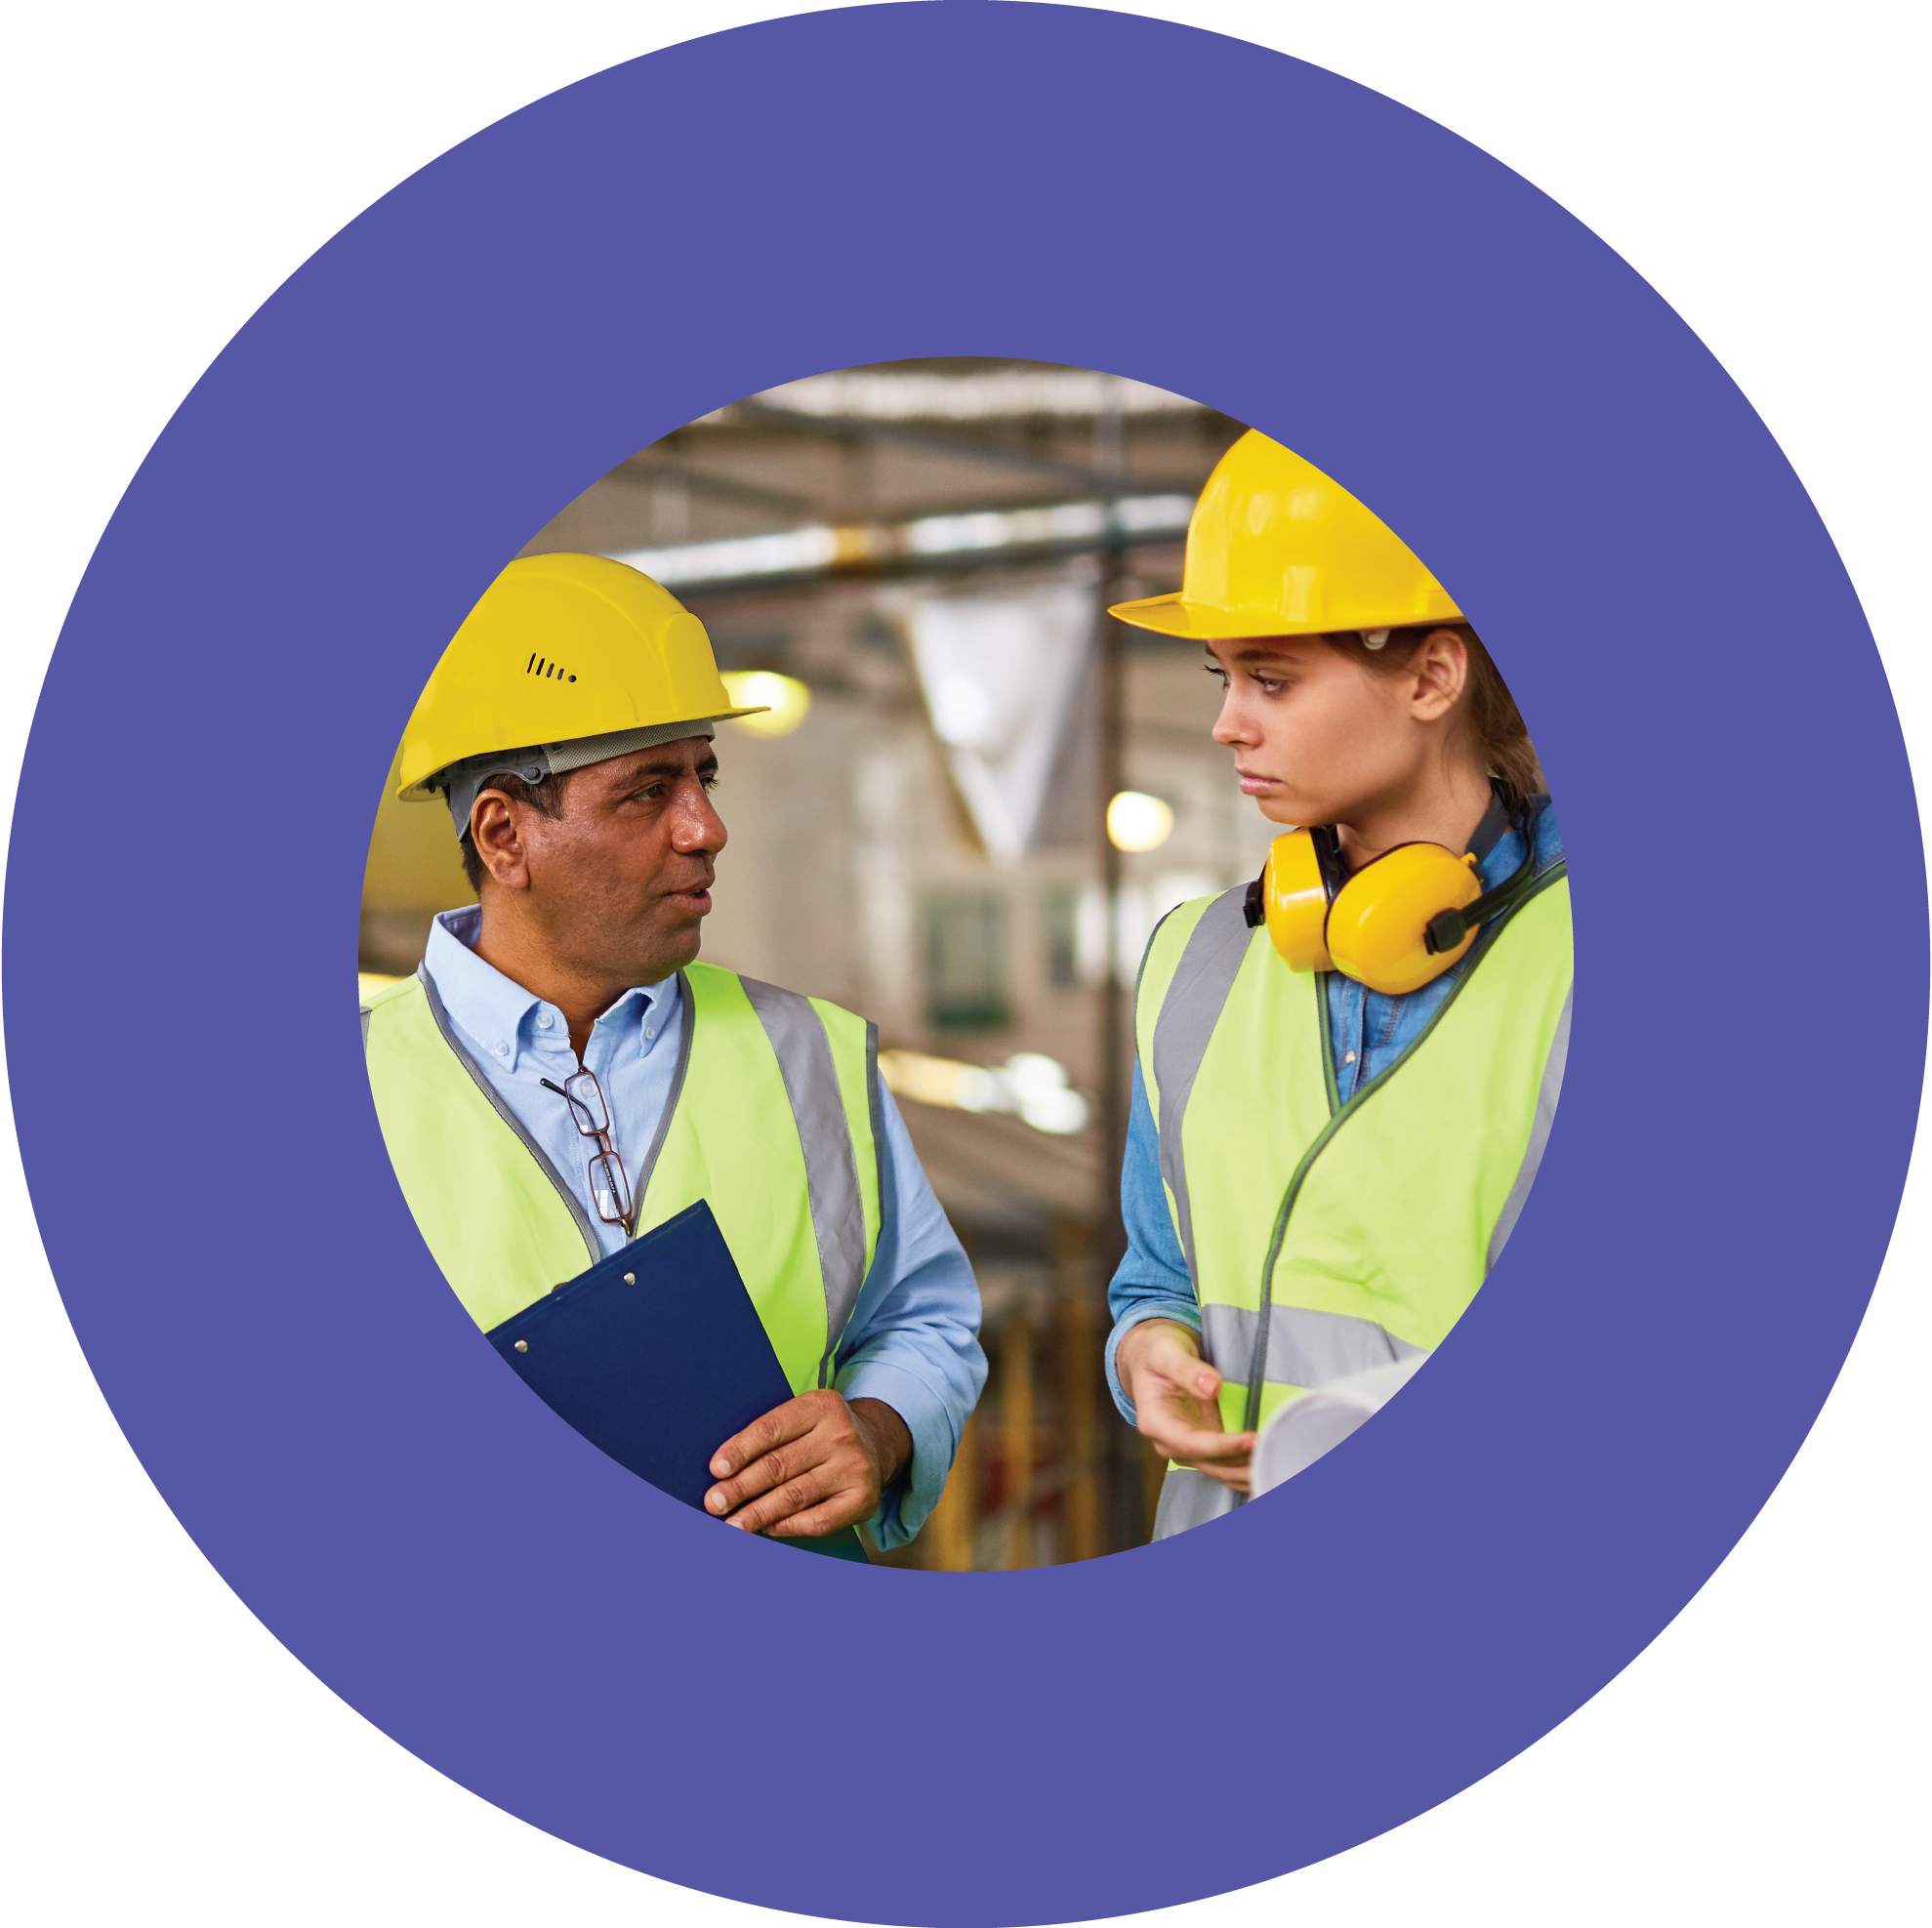 ORG_Module_Unions-Collaboration-Graphic_Union-Leaders_Mobile